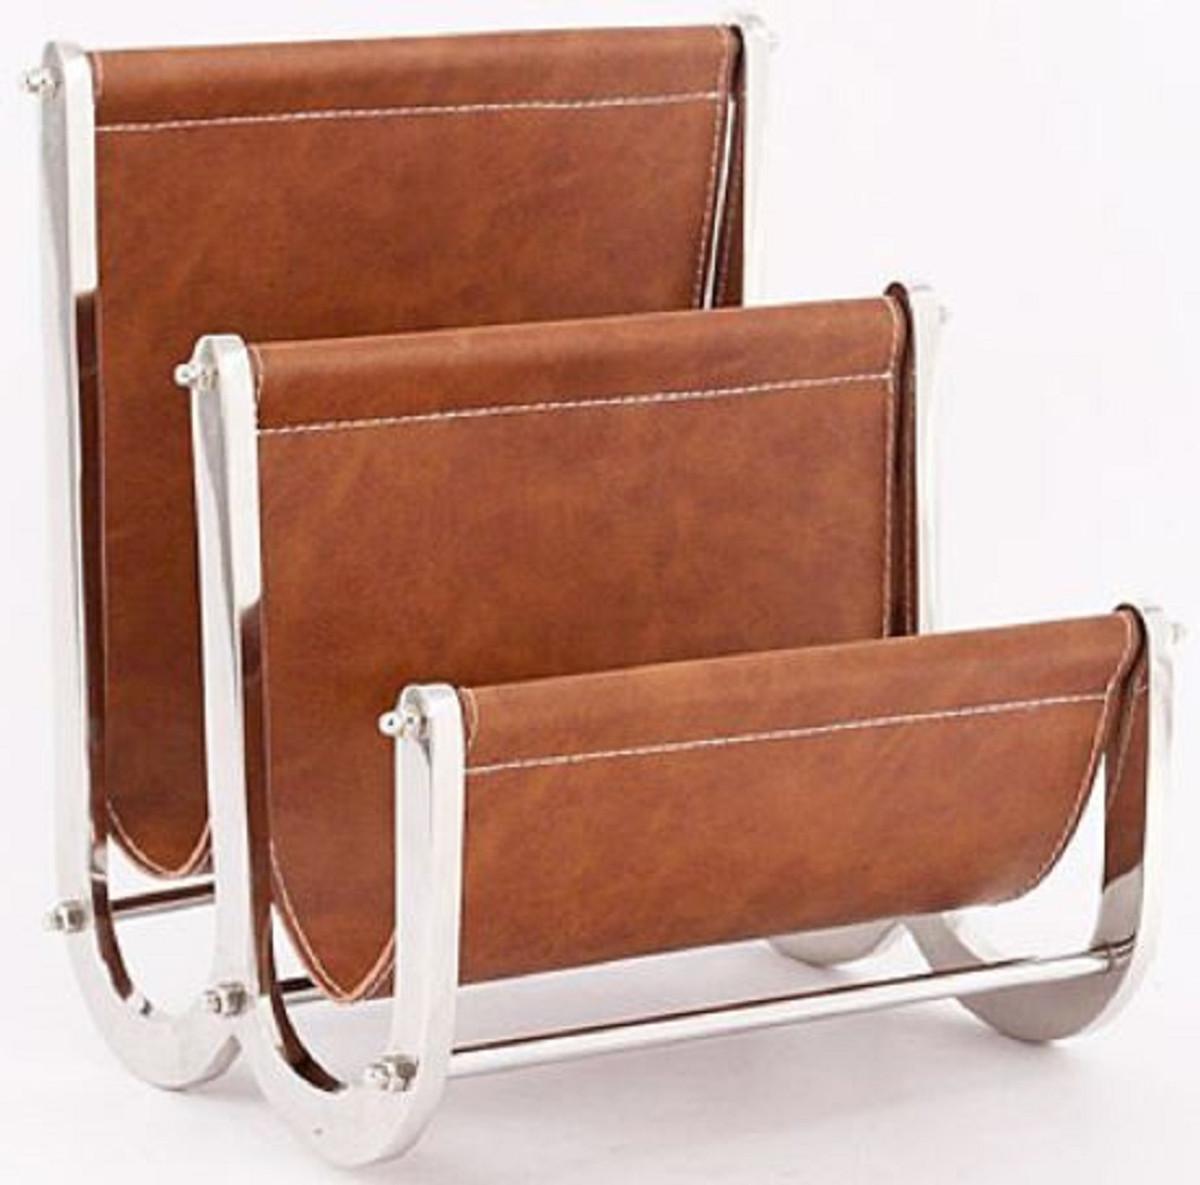 Aluminum Magazine Rack With Genuine Leather Luxury Accessories